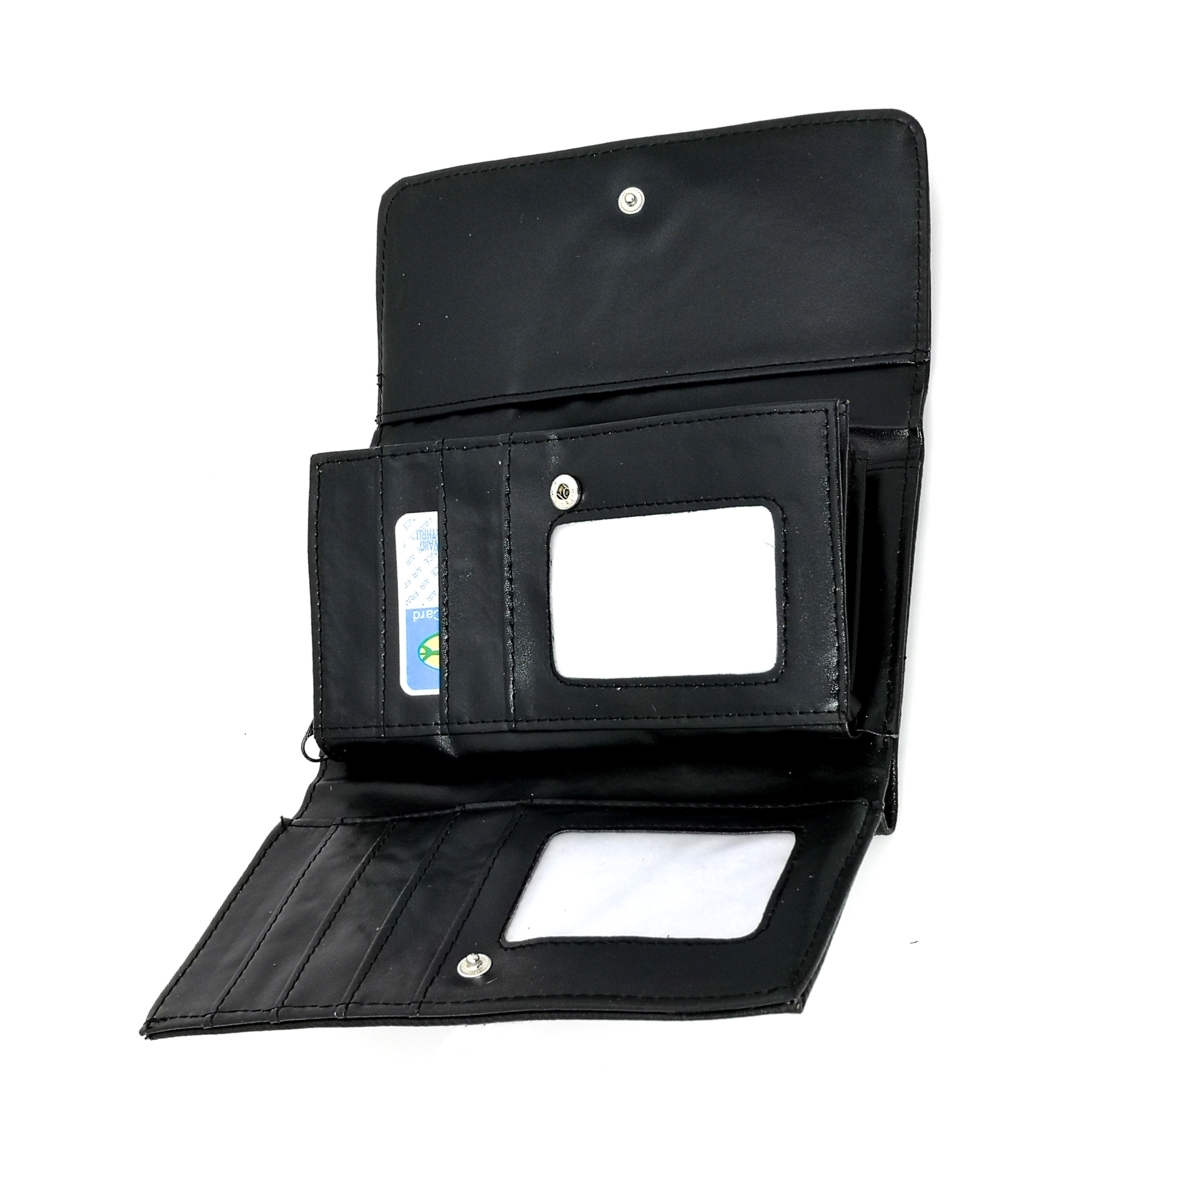 Portofel dama, negru, cu buzunar mare lateral pentru bancnote, din piele ecologica, 18/10 cm, Magrot017